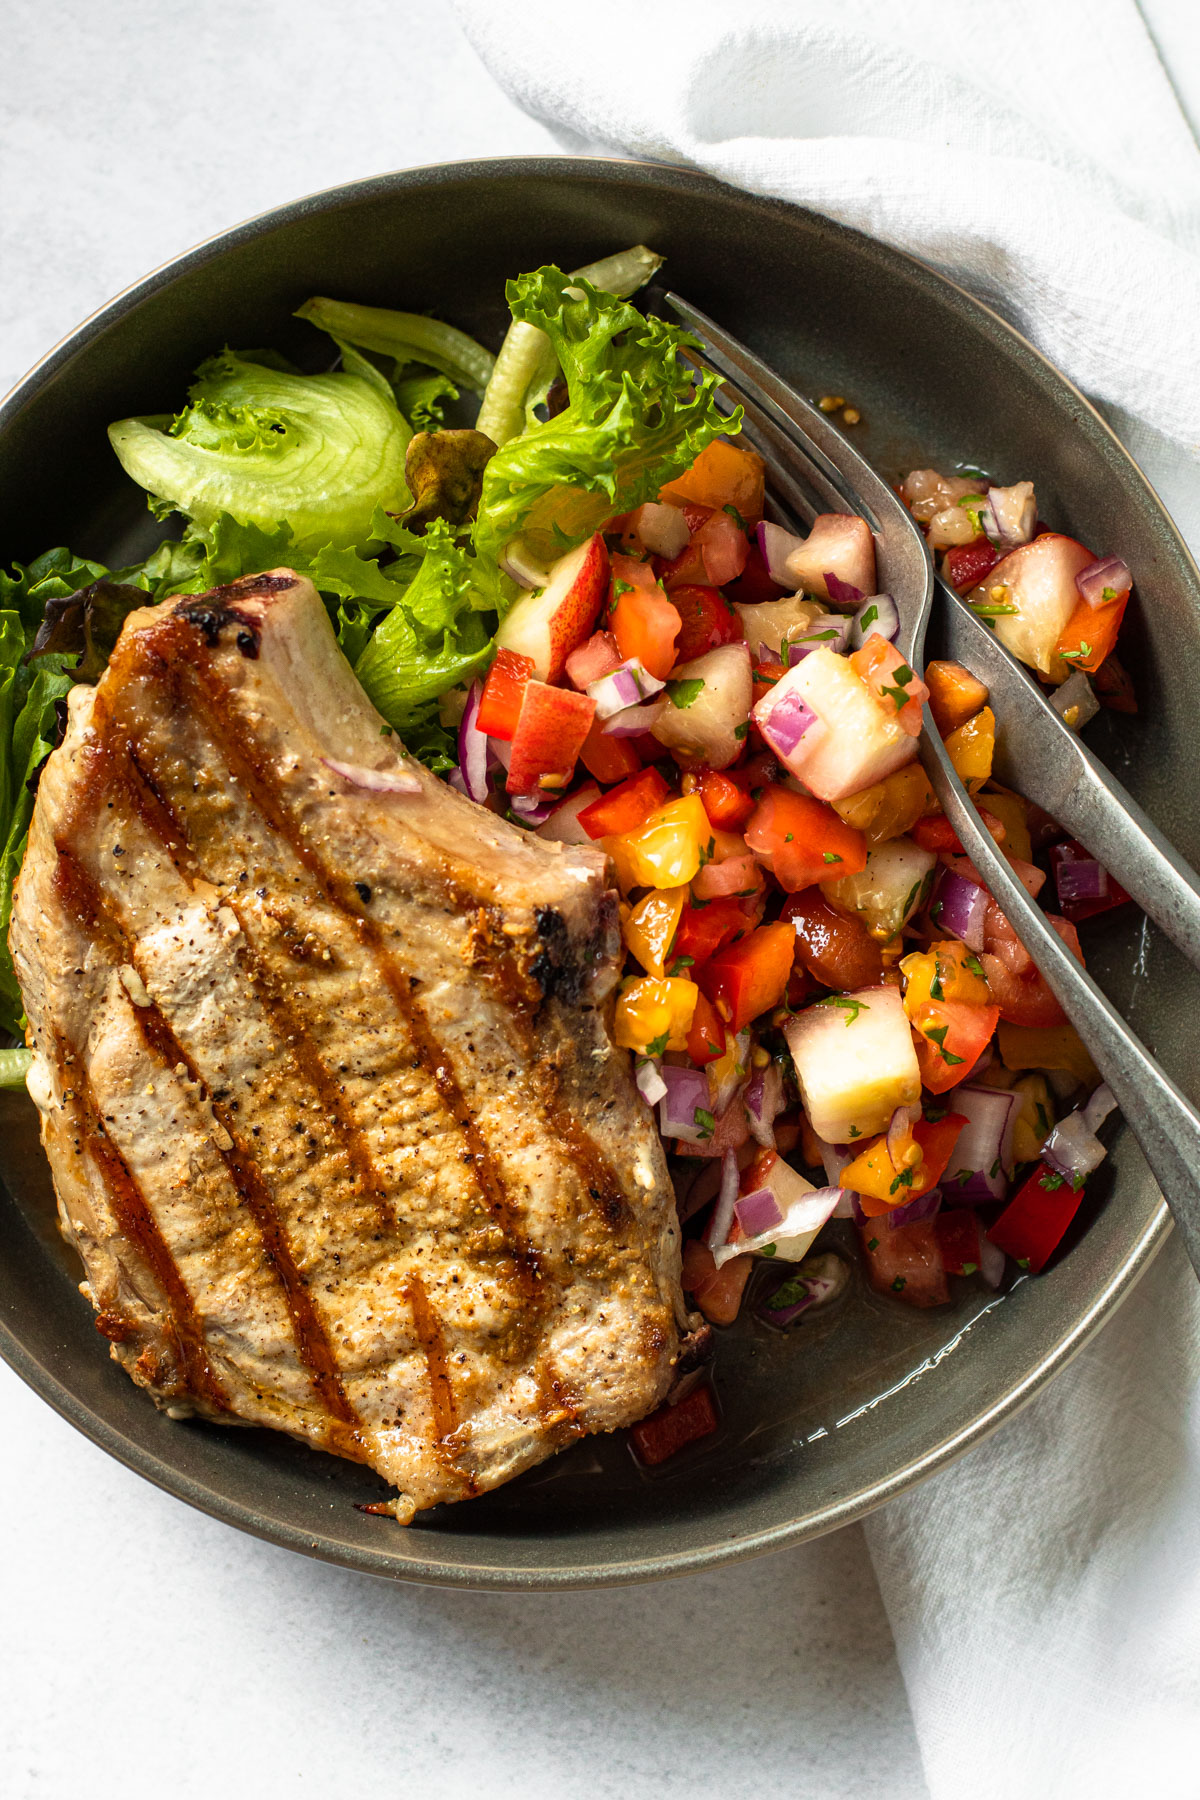 Grilled pork chops with peach salsa.